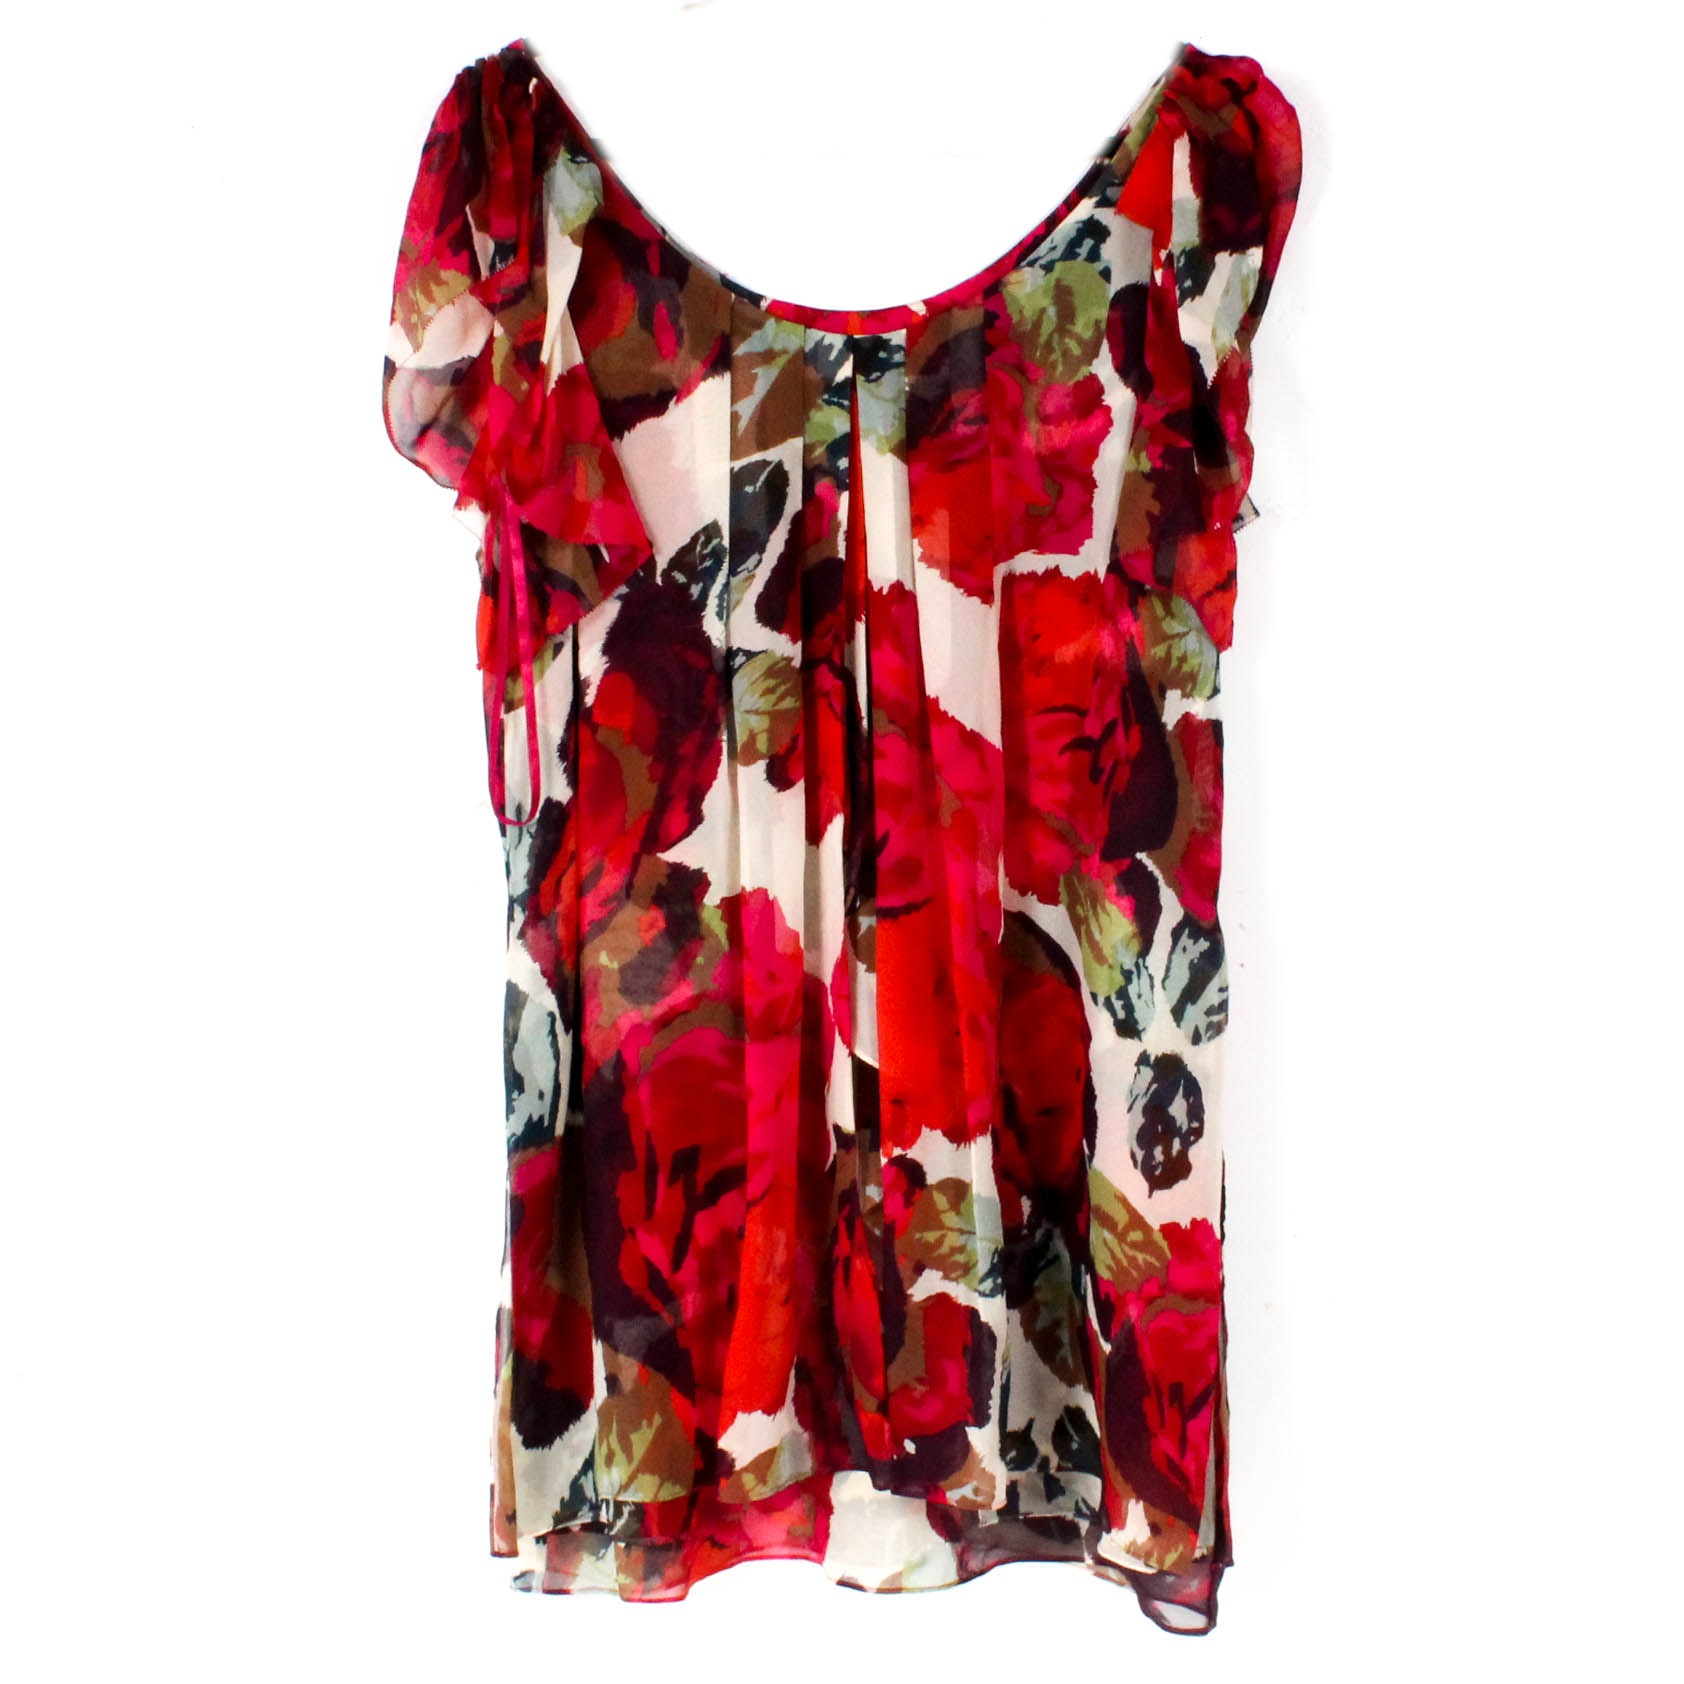 Diane von Furstenberg Silk Chiffon Mini Shift Dress